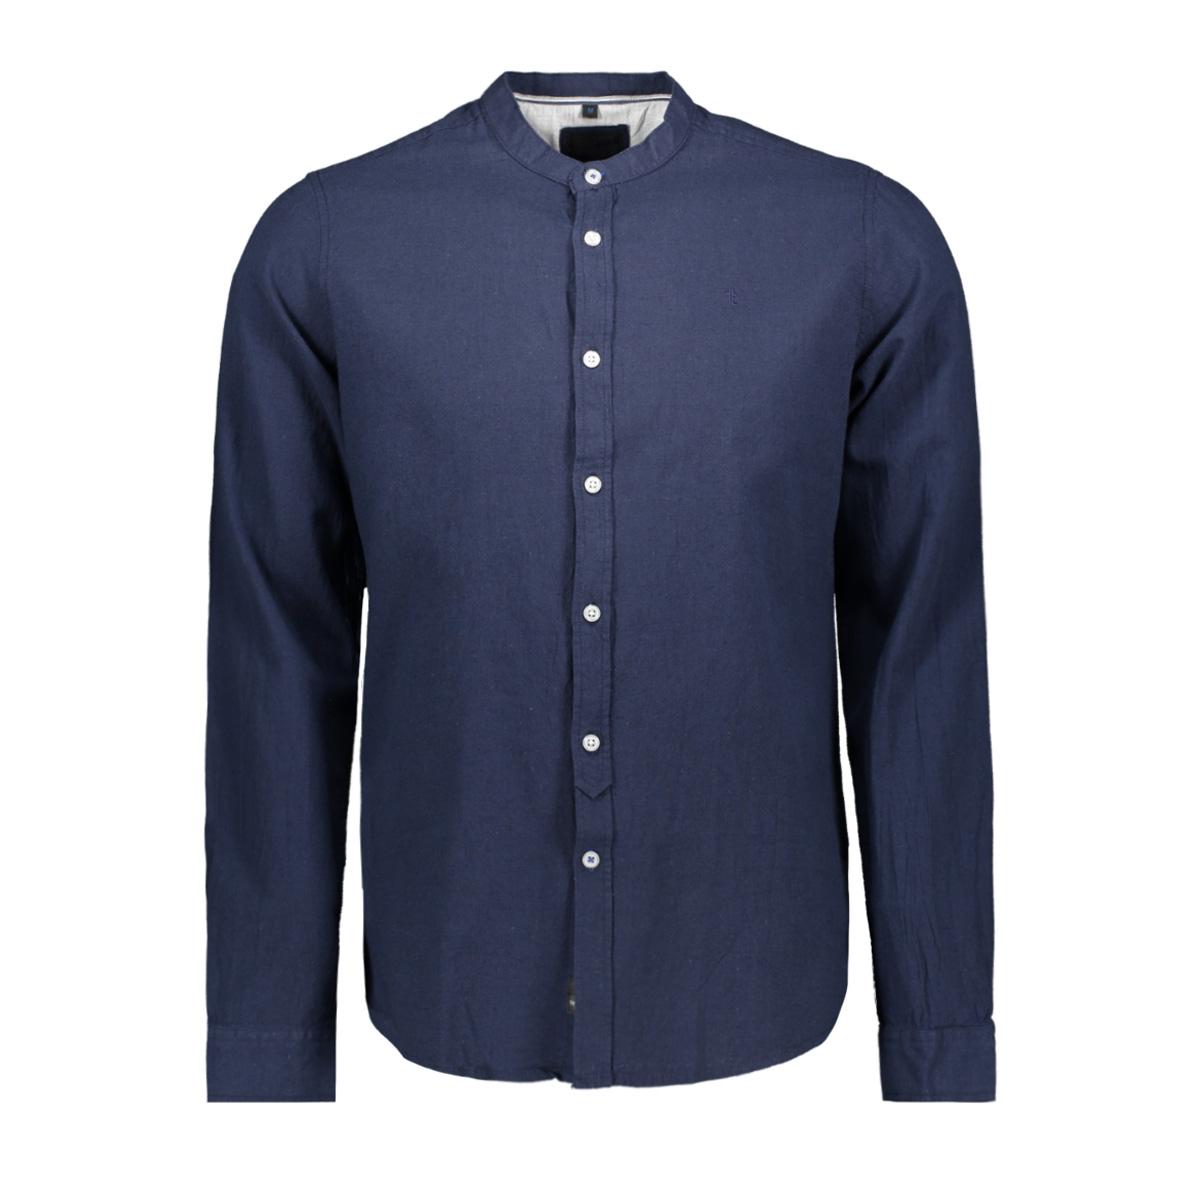 1901 2217 m 1 twinlife overhemd 6990 nightblue